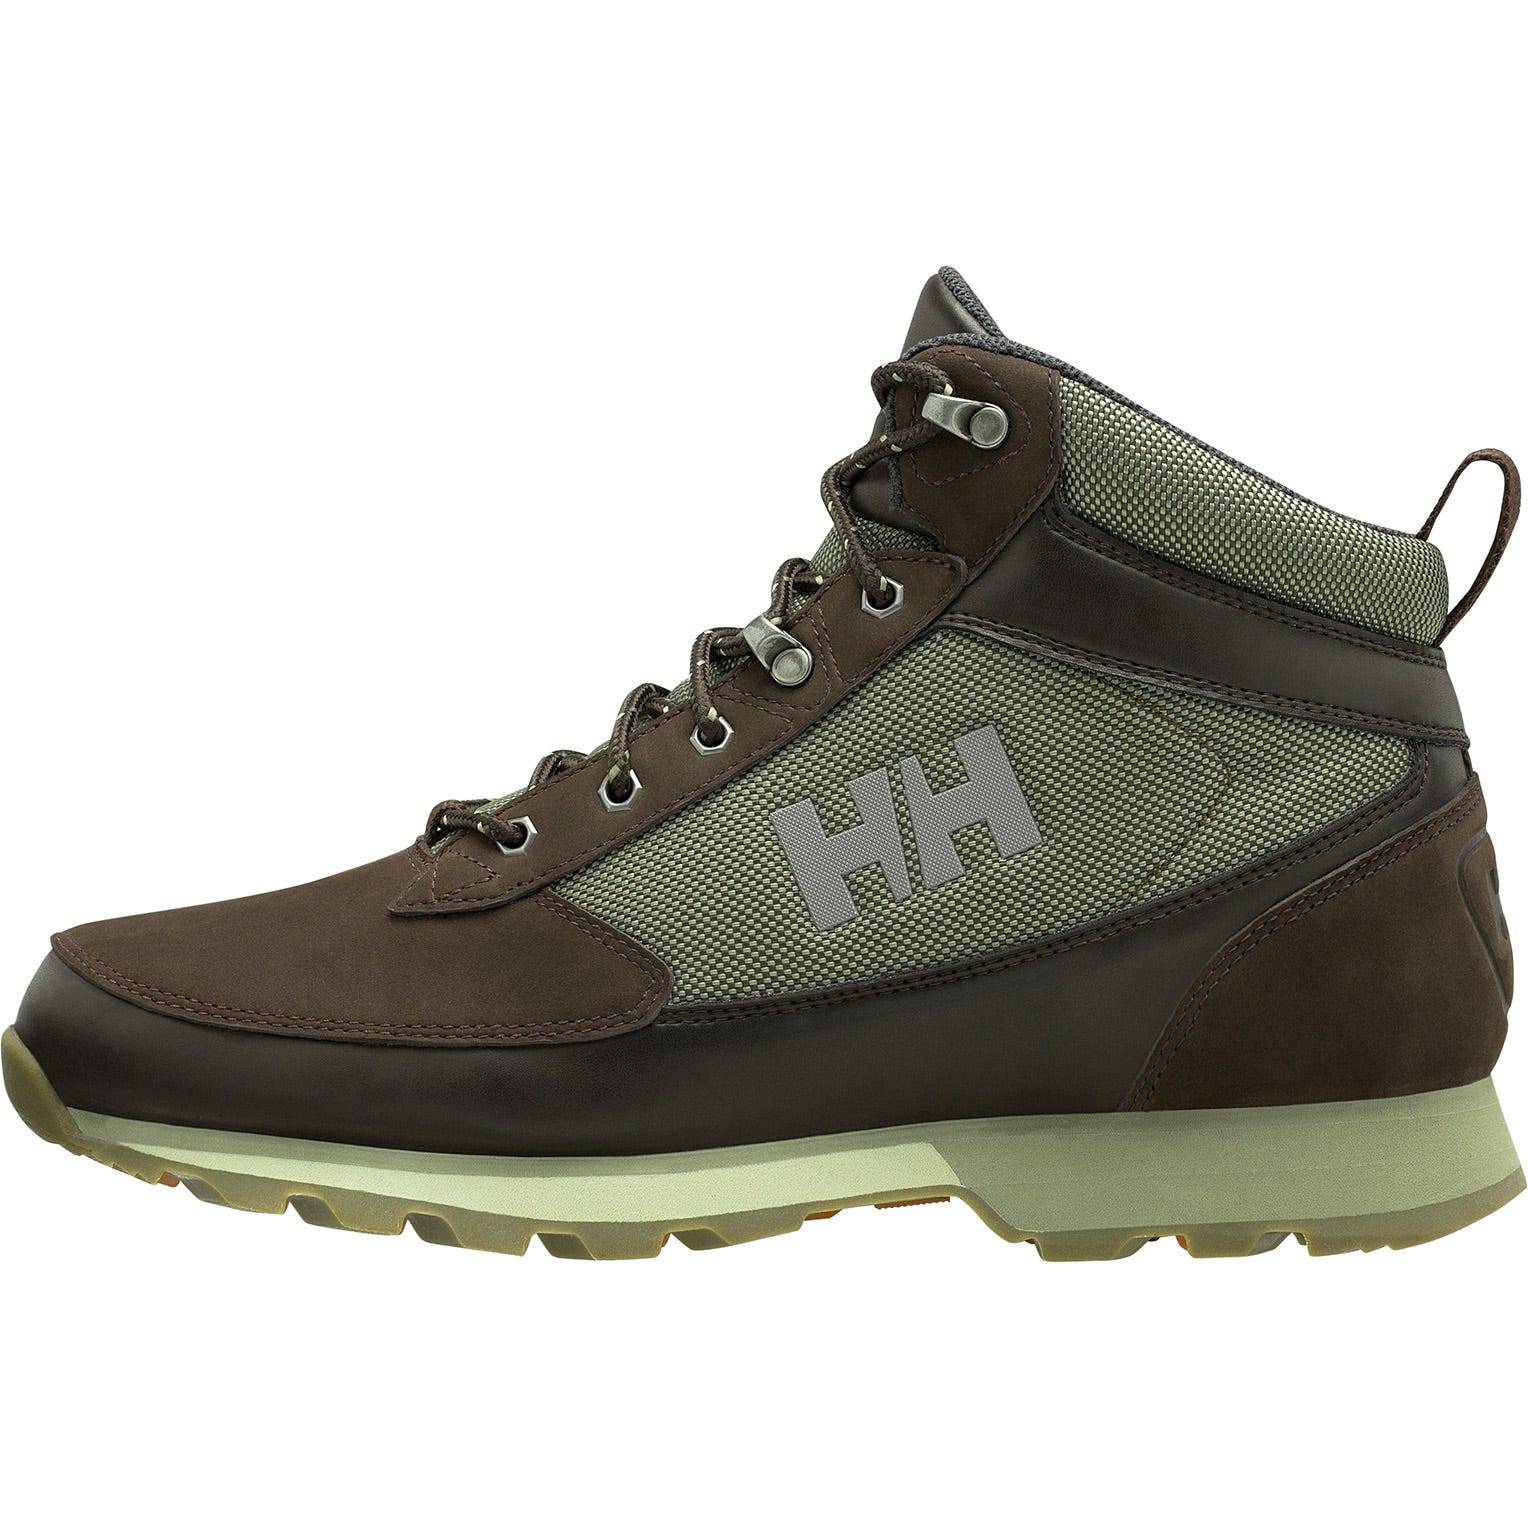 Helly Hansen Chilcotin Mens Winter Boot Brown 42.5/9